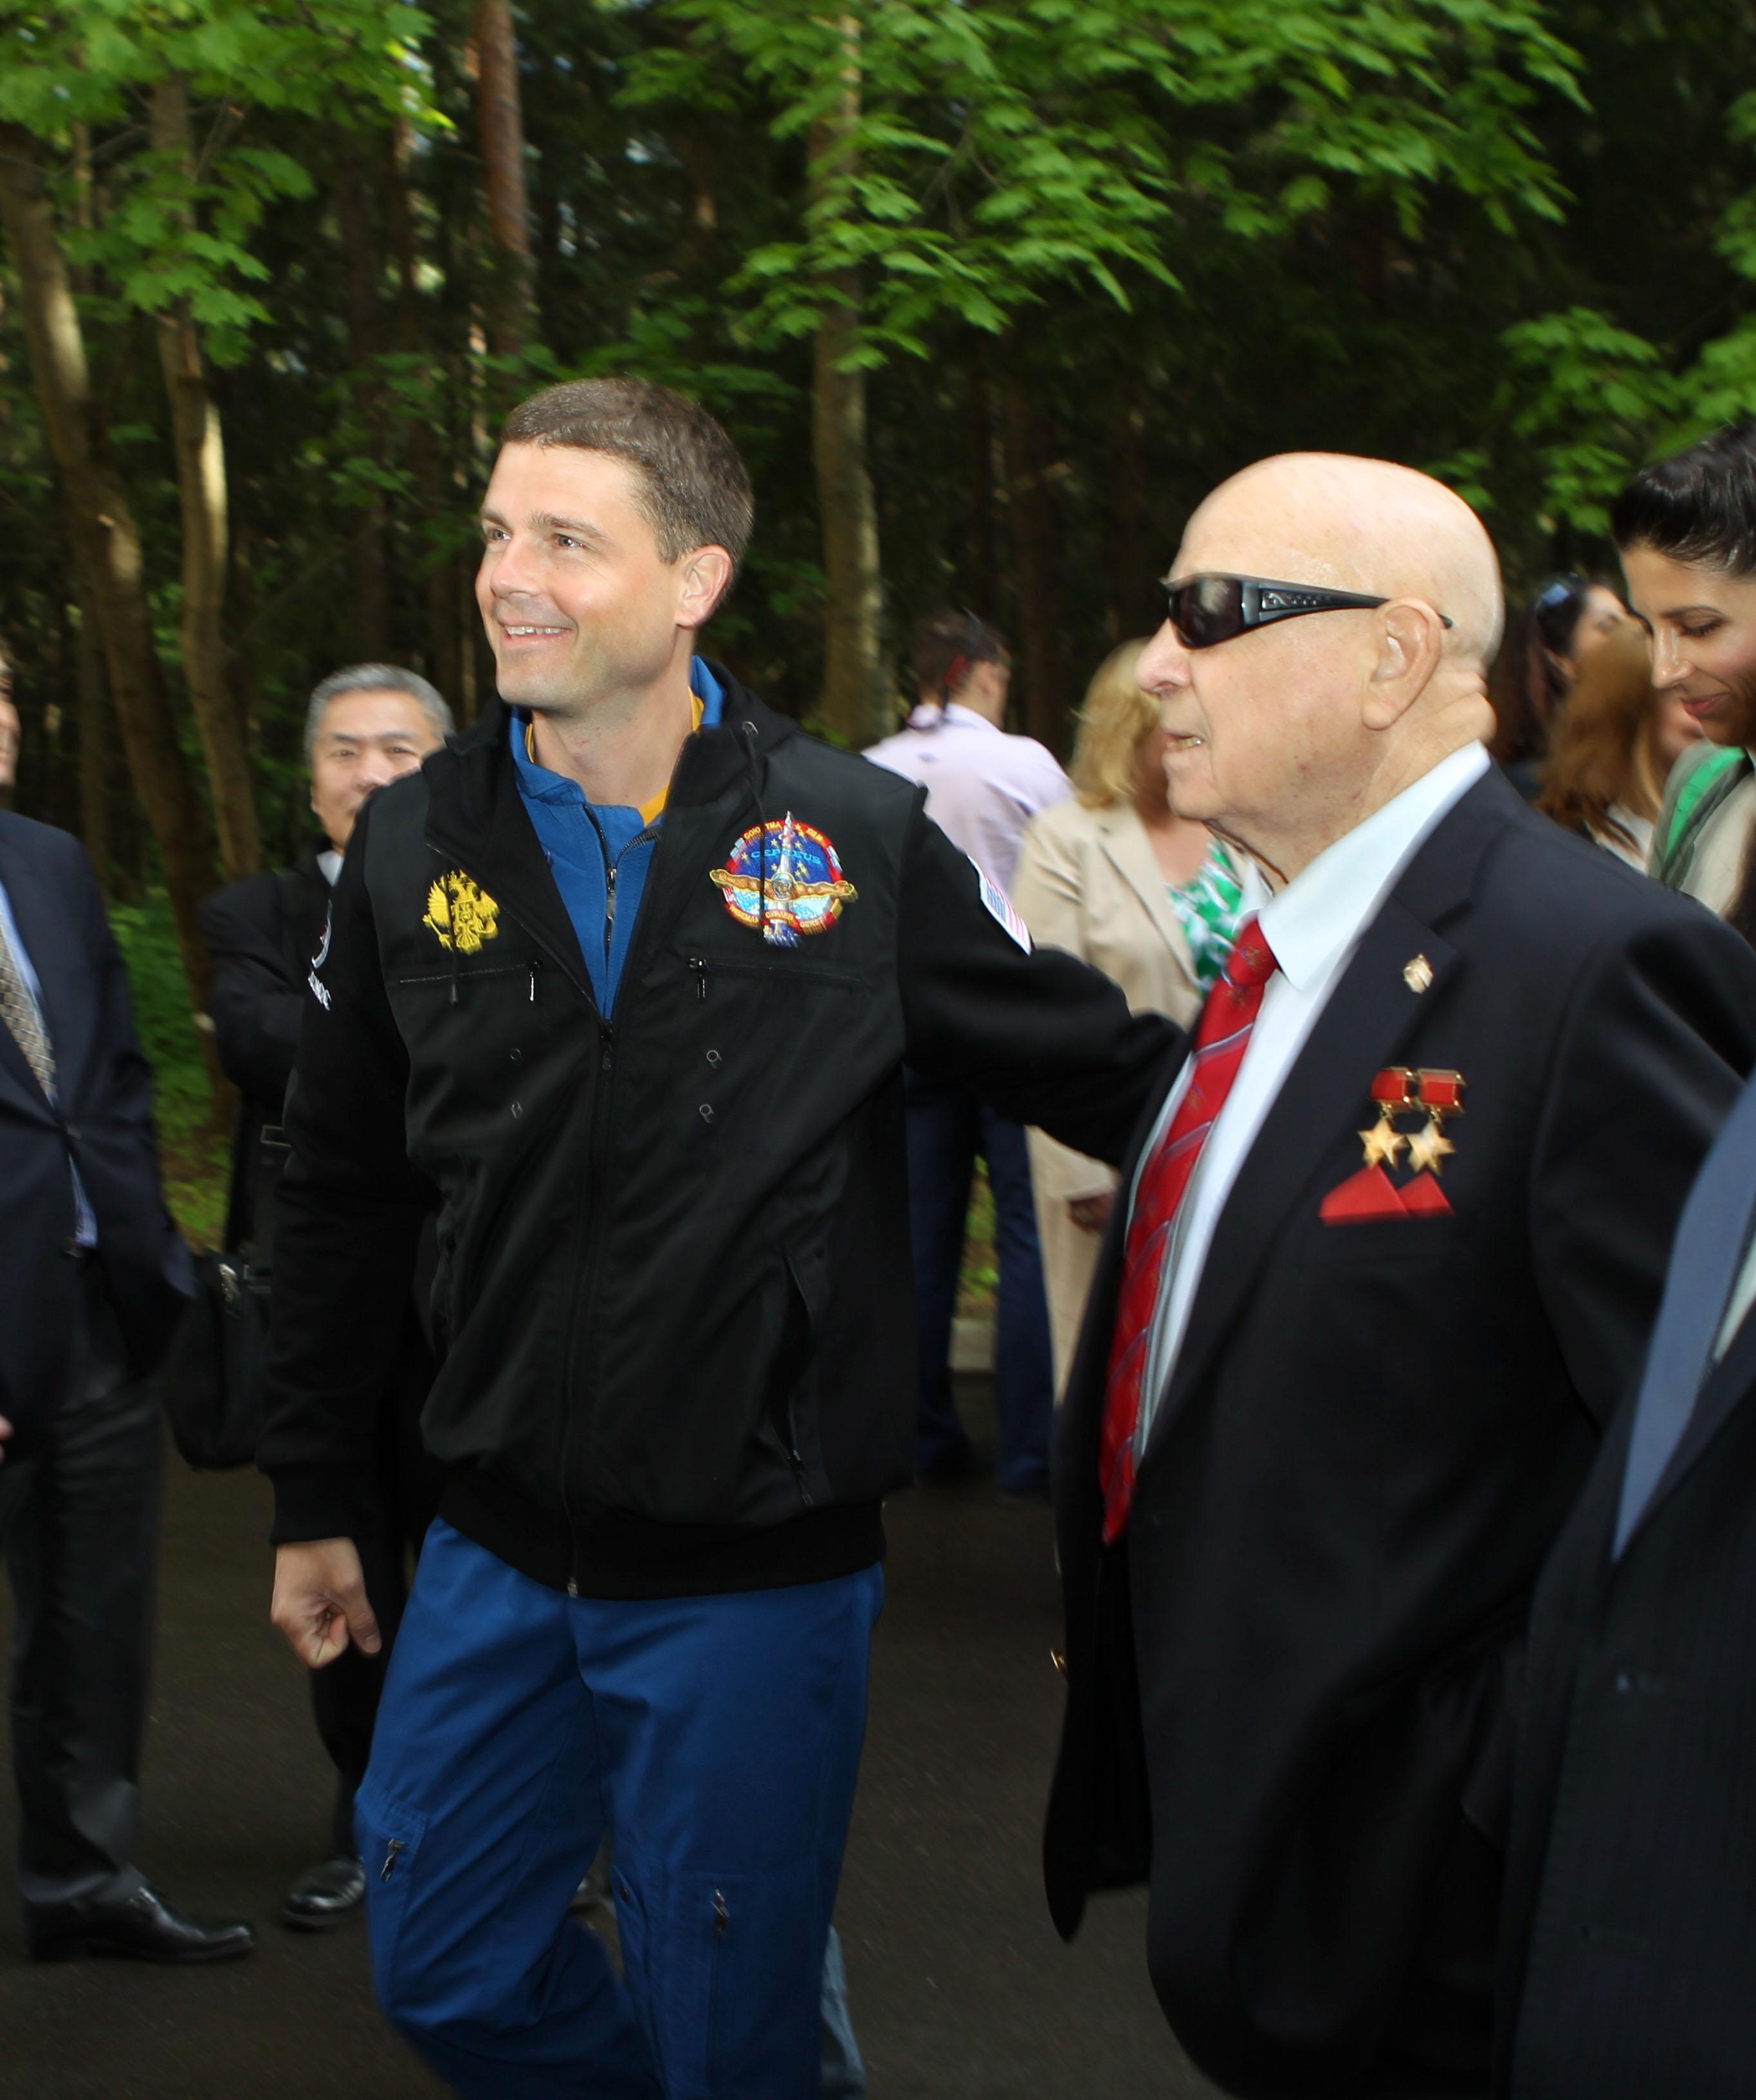 Reid Wiseman and Former Cosmonaut Alexey Leonov | NASA